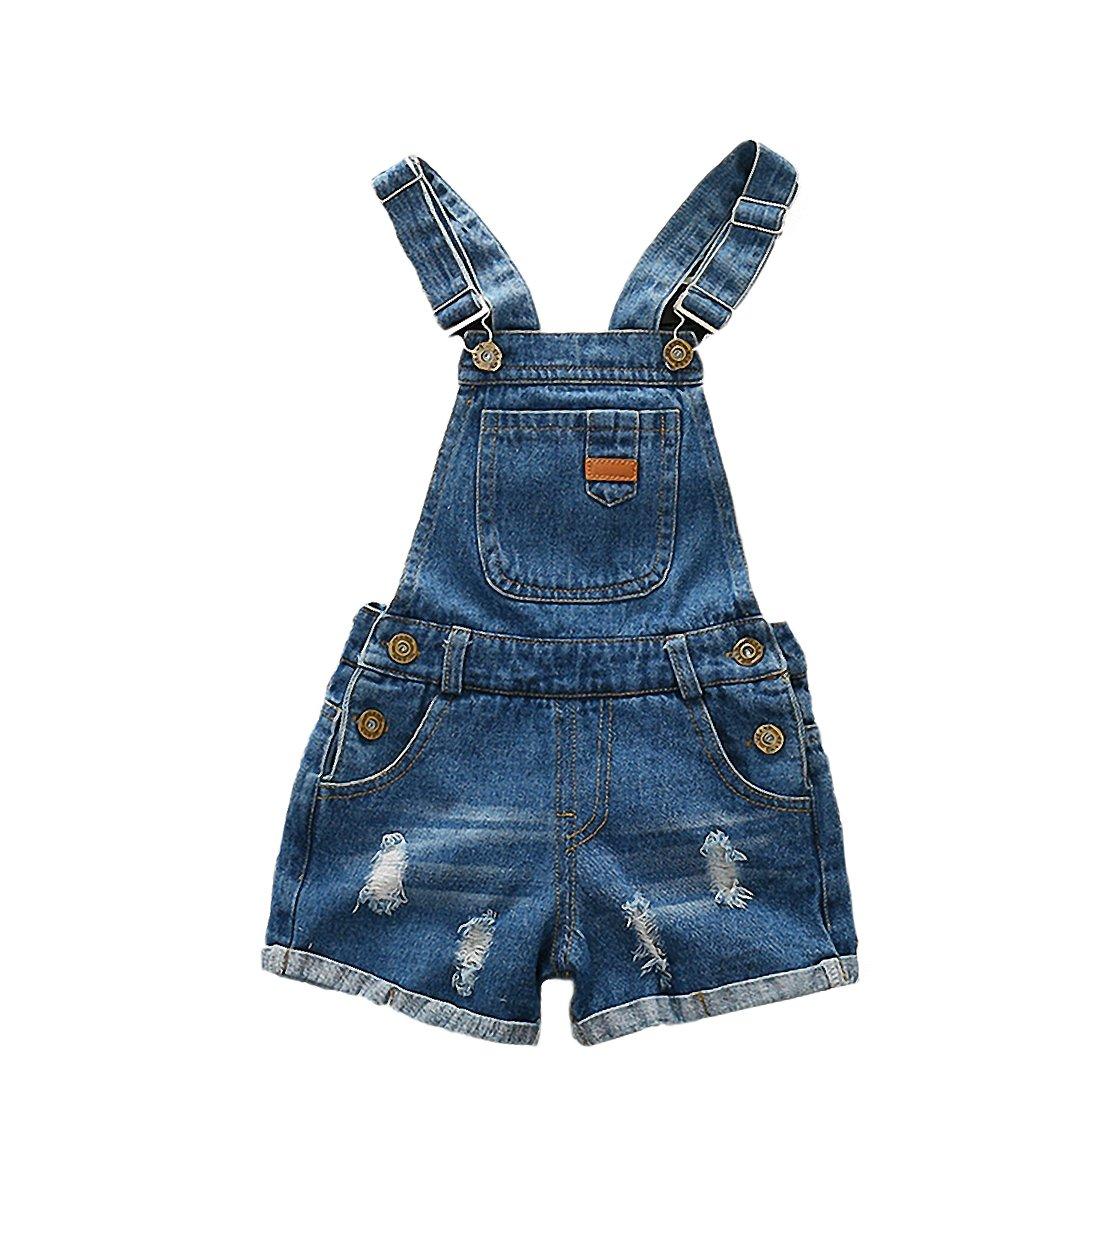 Kidscool Girls/Boys Big Bib Ripped Jeans Summer Shortall,Blue,6-7 Years